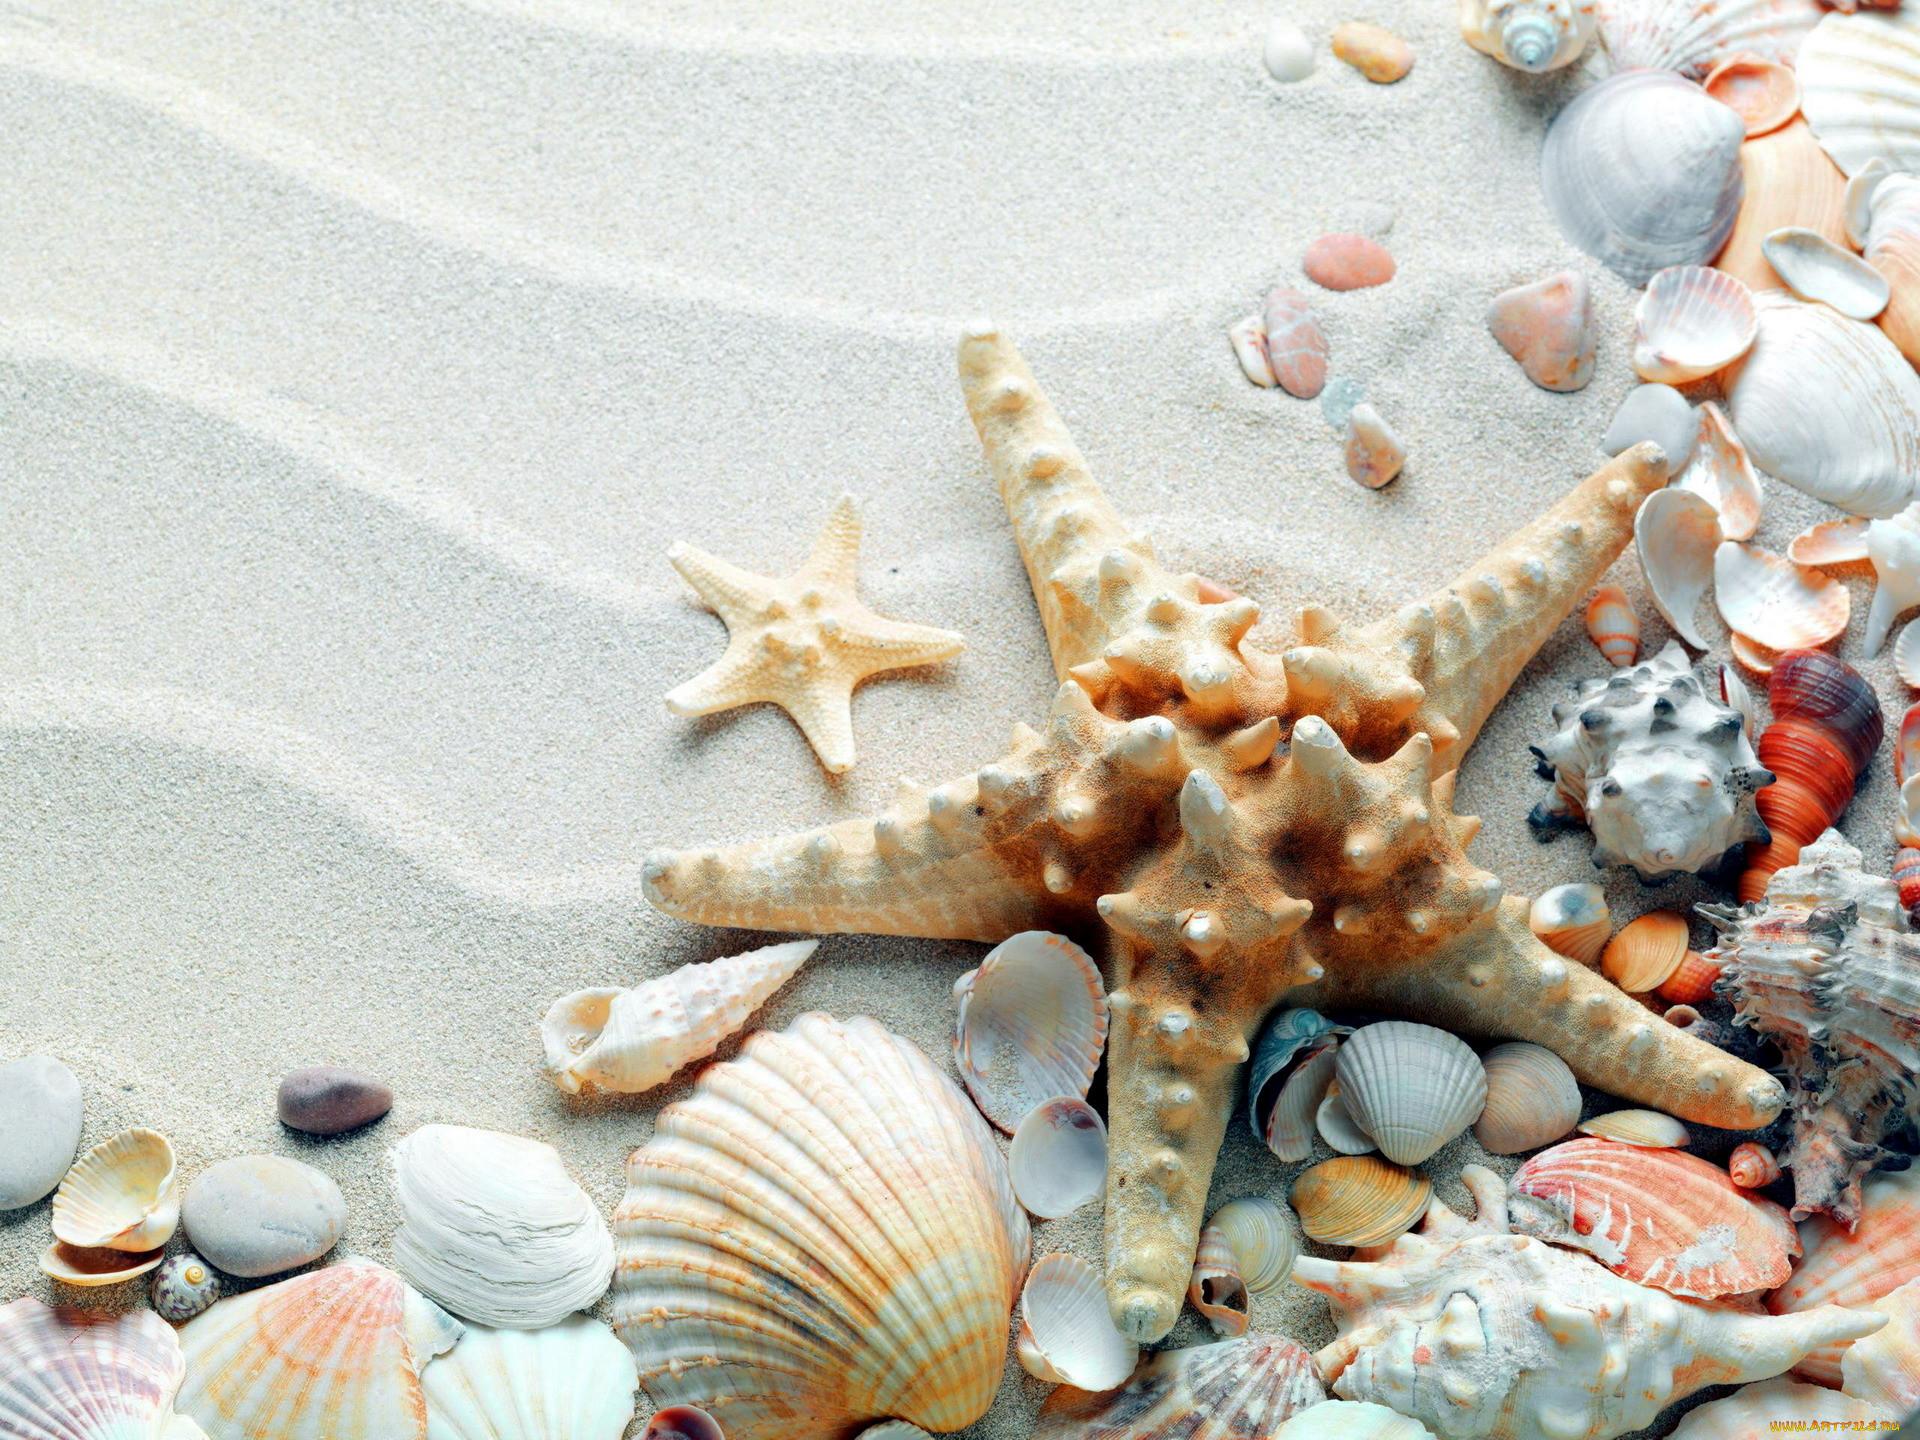 Обои ракушка, морская звезда. Разное foto 6